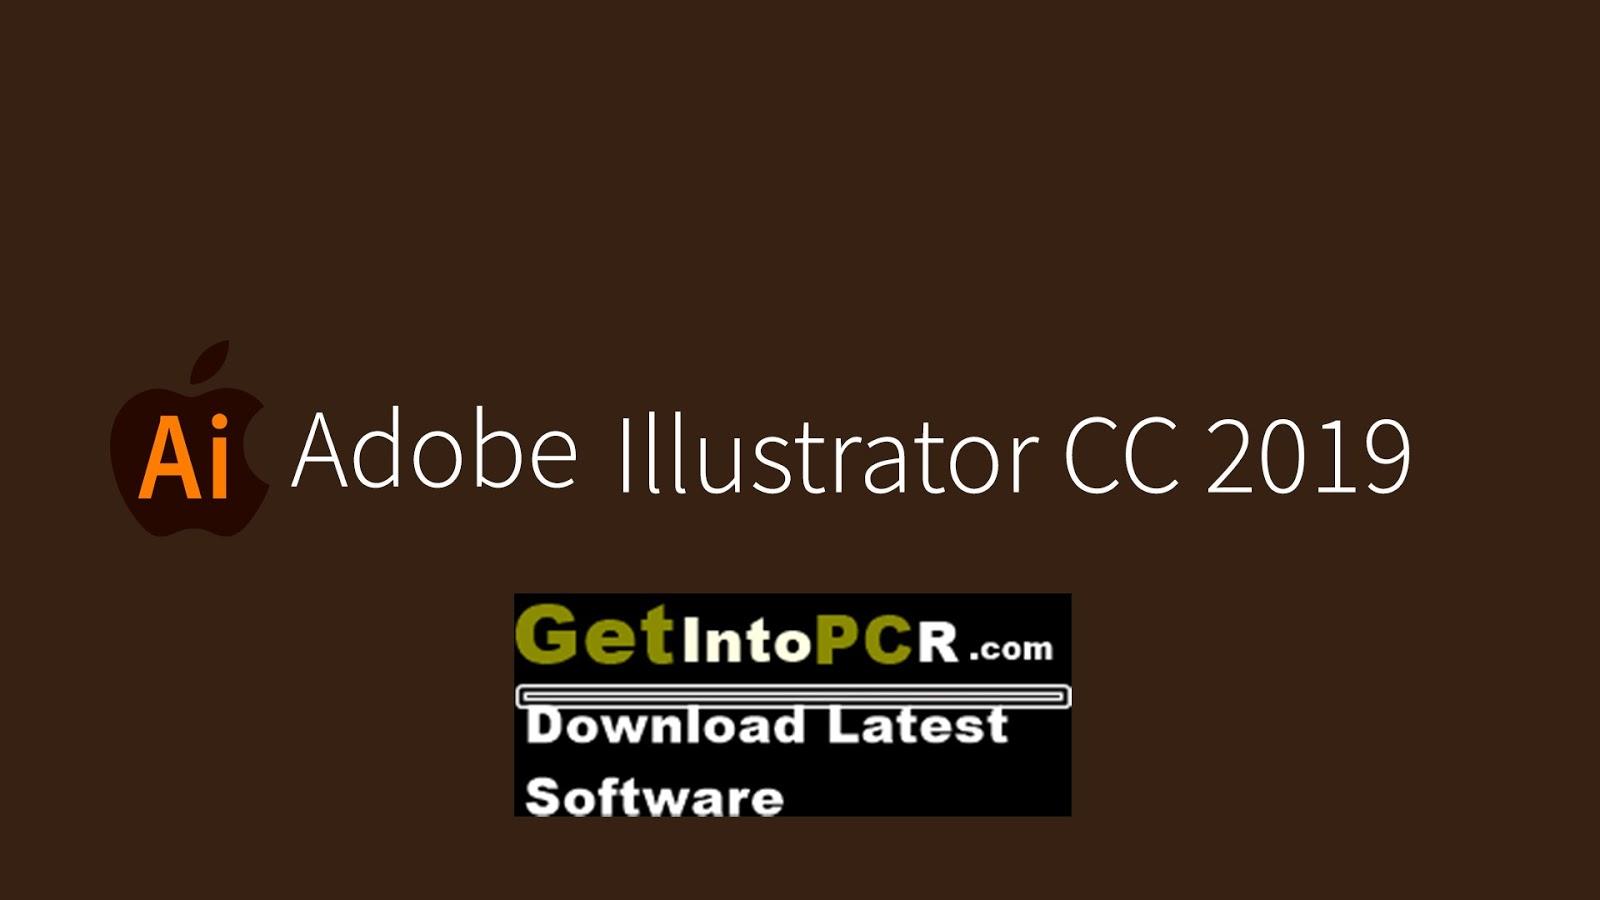 adobe illustrator free download for windows 10 filehippo